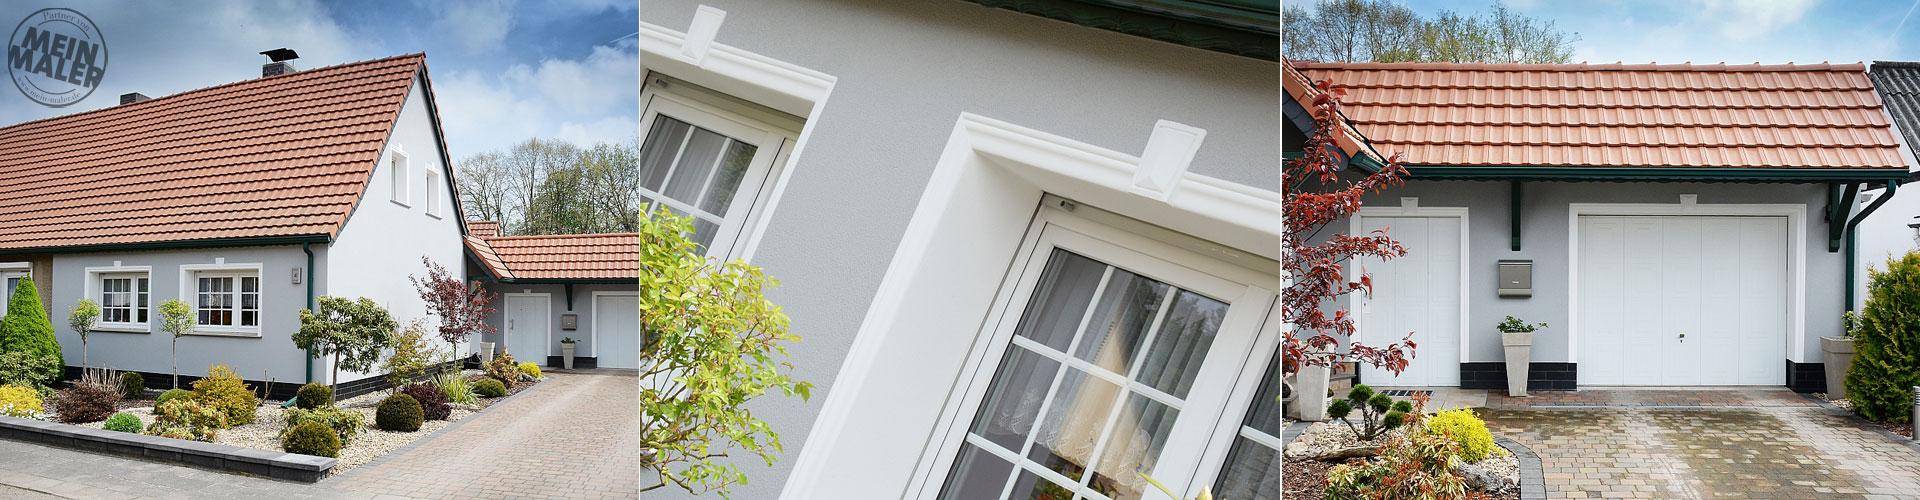 Anspruchsvoll Farbgestaltung Fassade Galerie Von Fassaden-sanierung / Fassadengestaltung